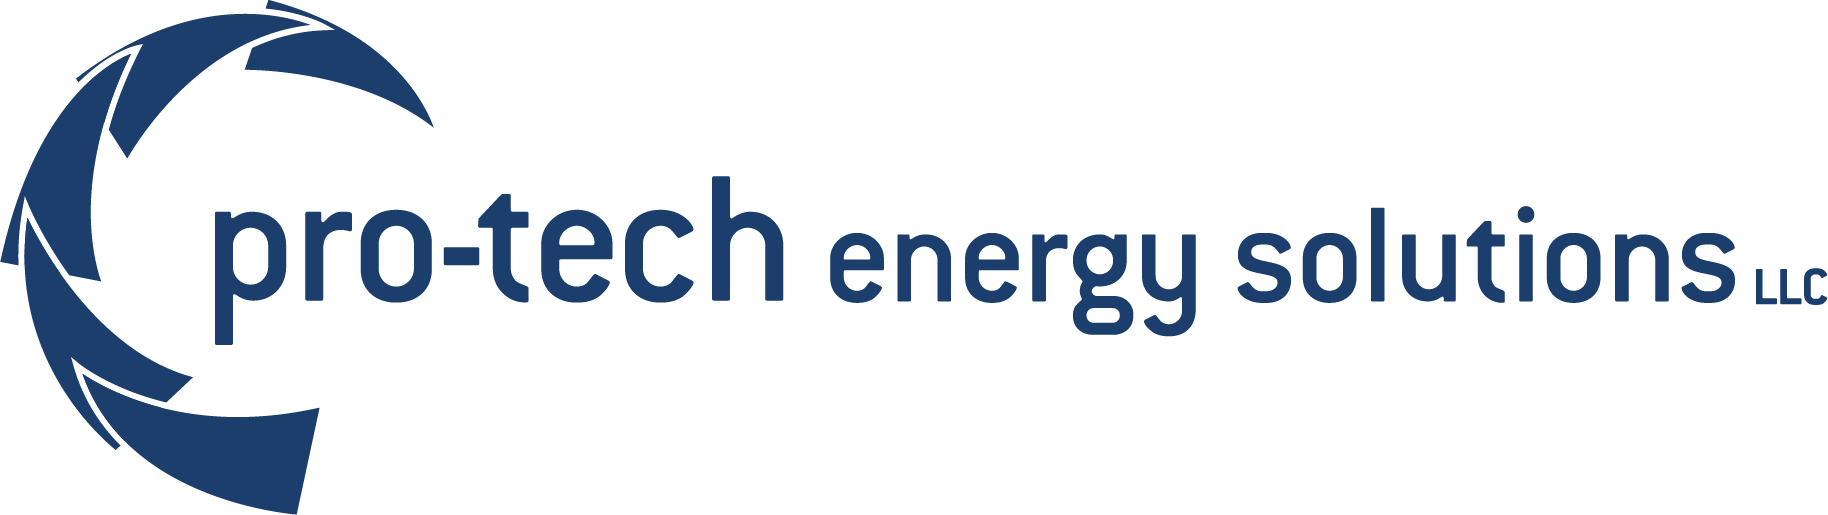 Pro-Tech Energy Solutions LLC